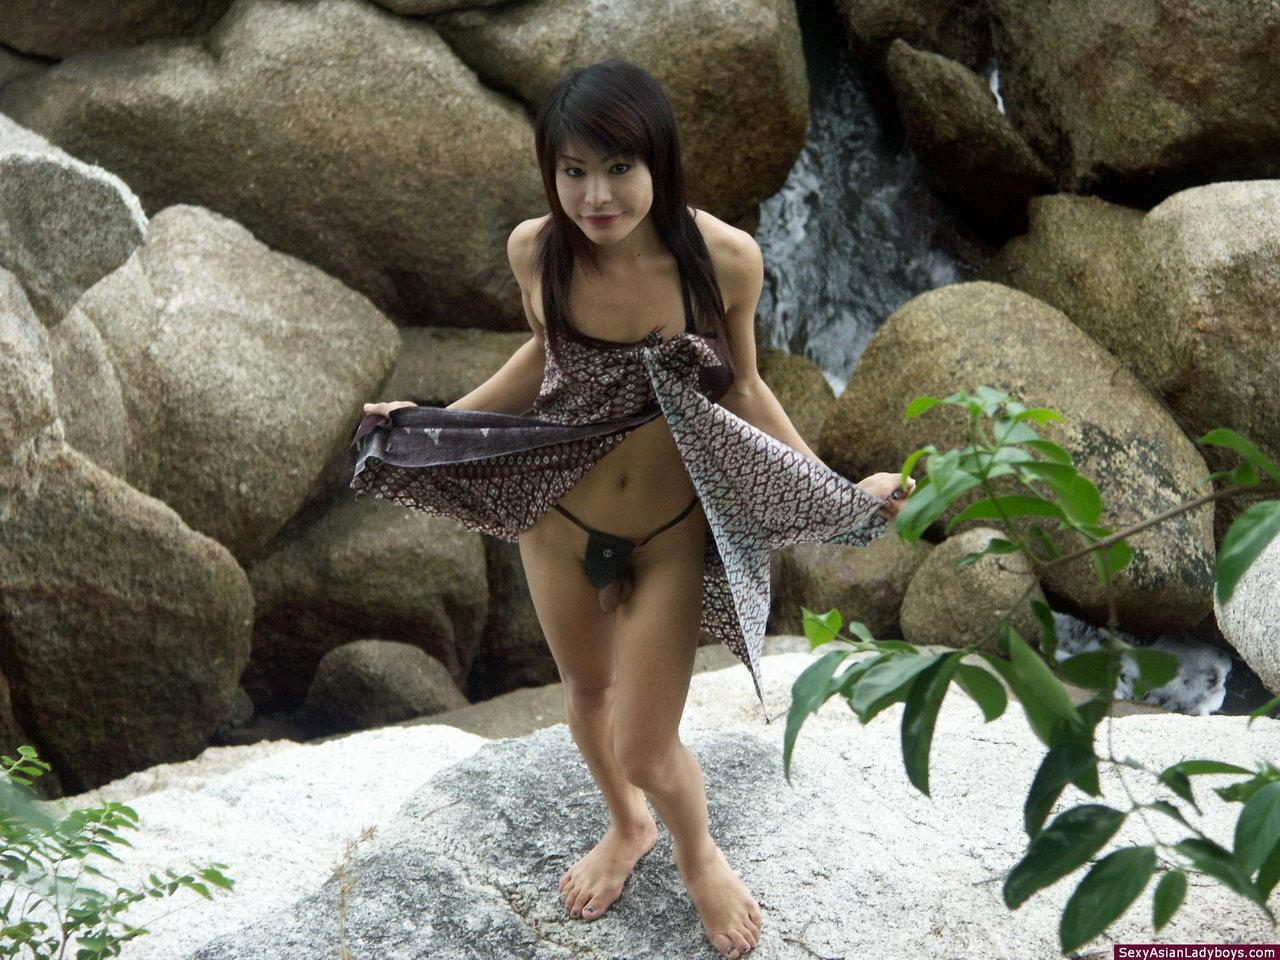 Sensuous Shemale Flashing Her Rock Raw Penis Outdoors